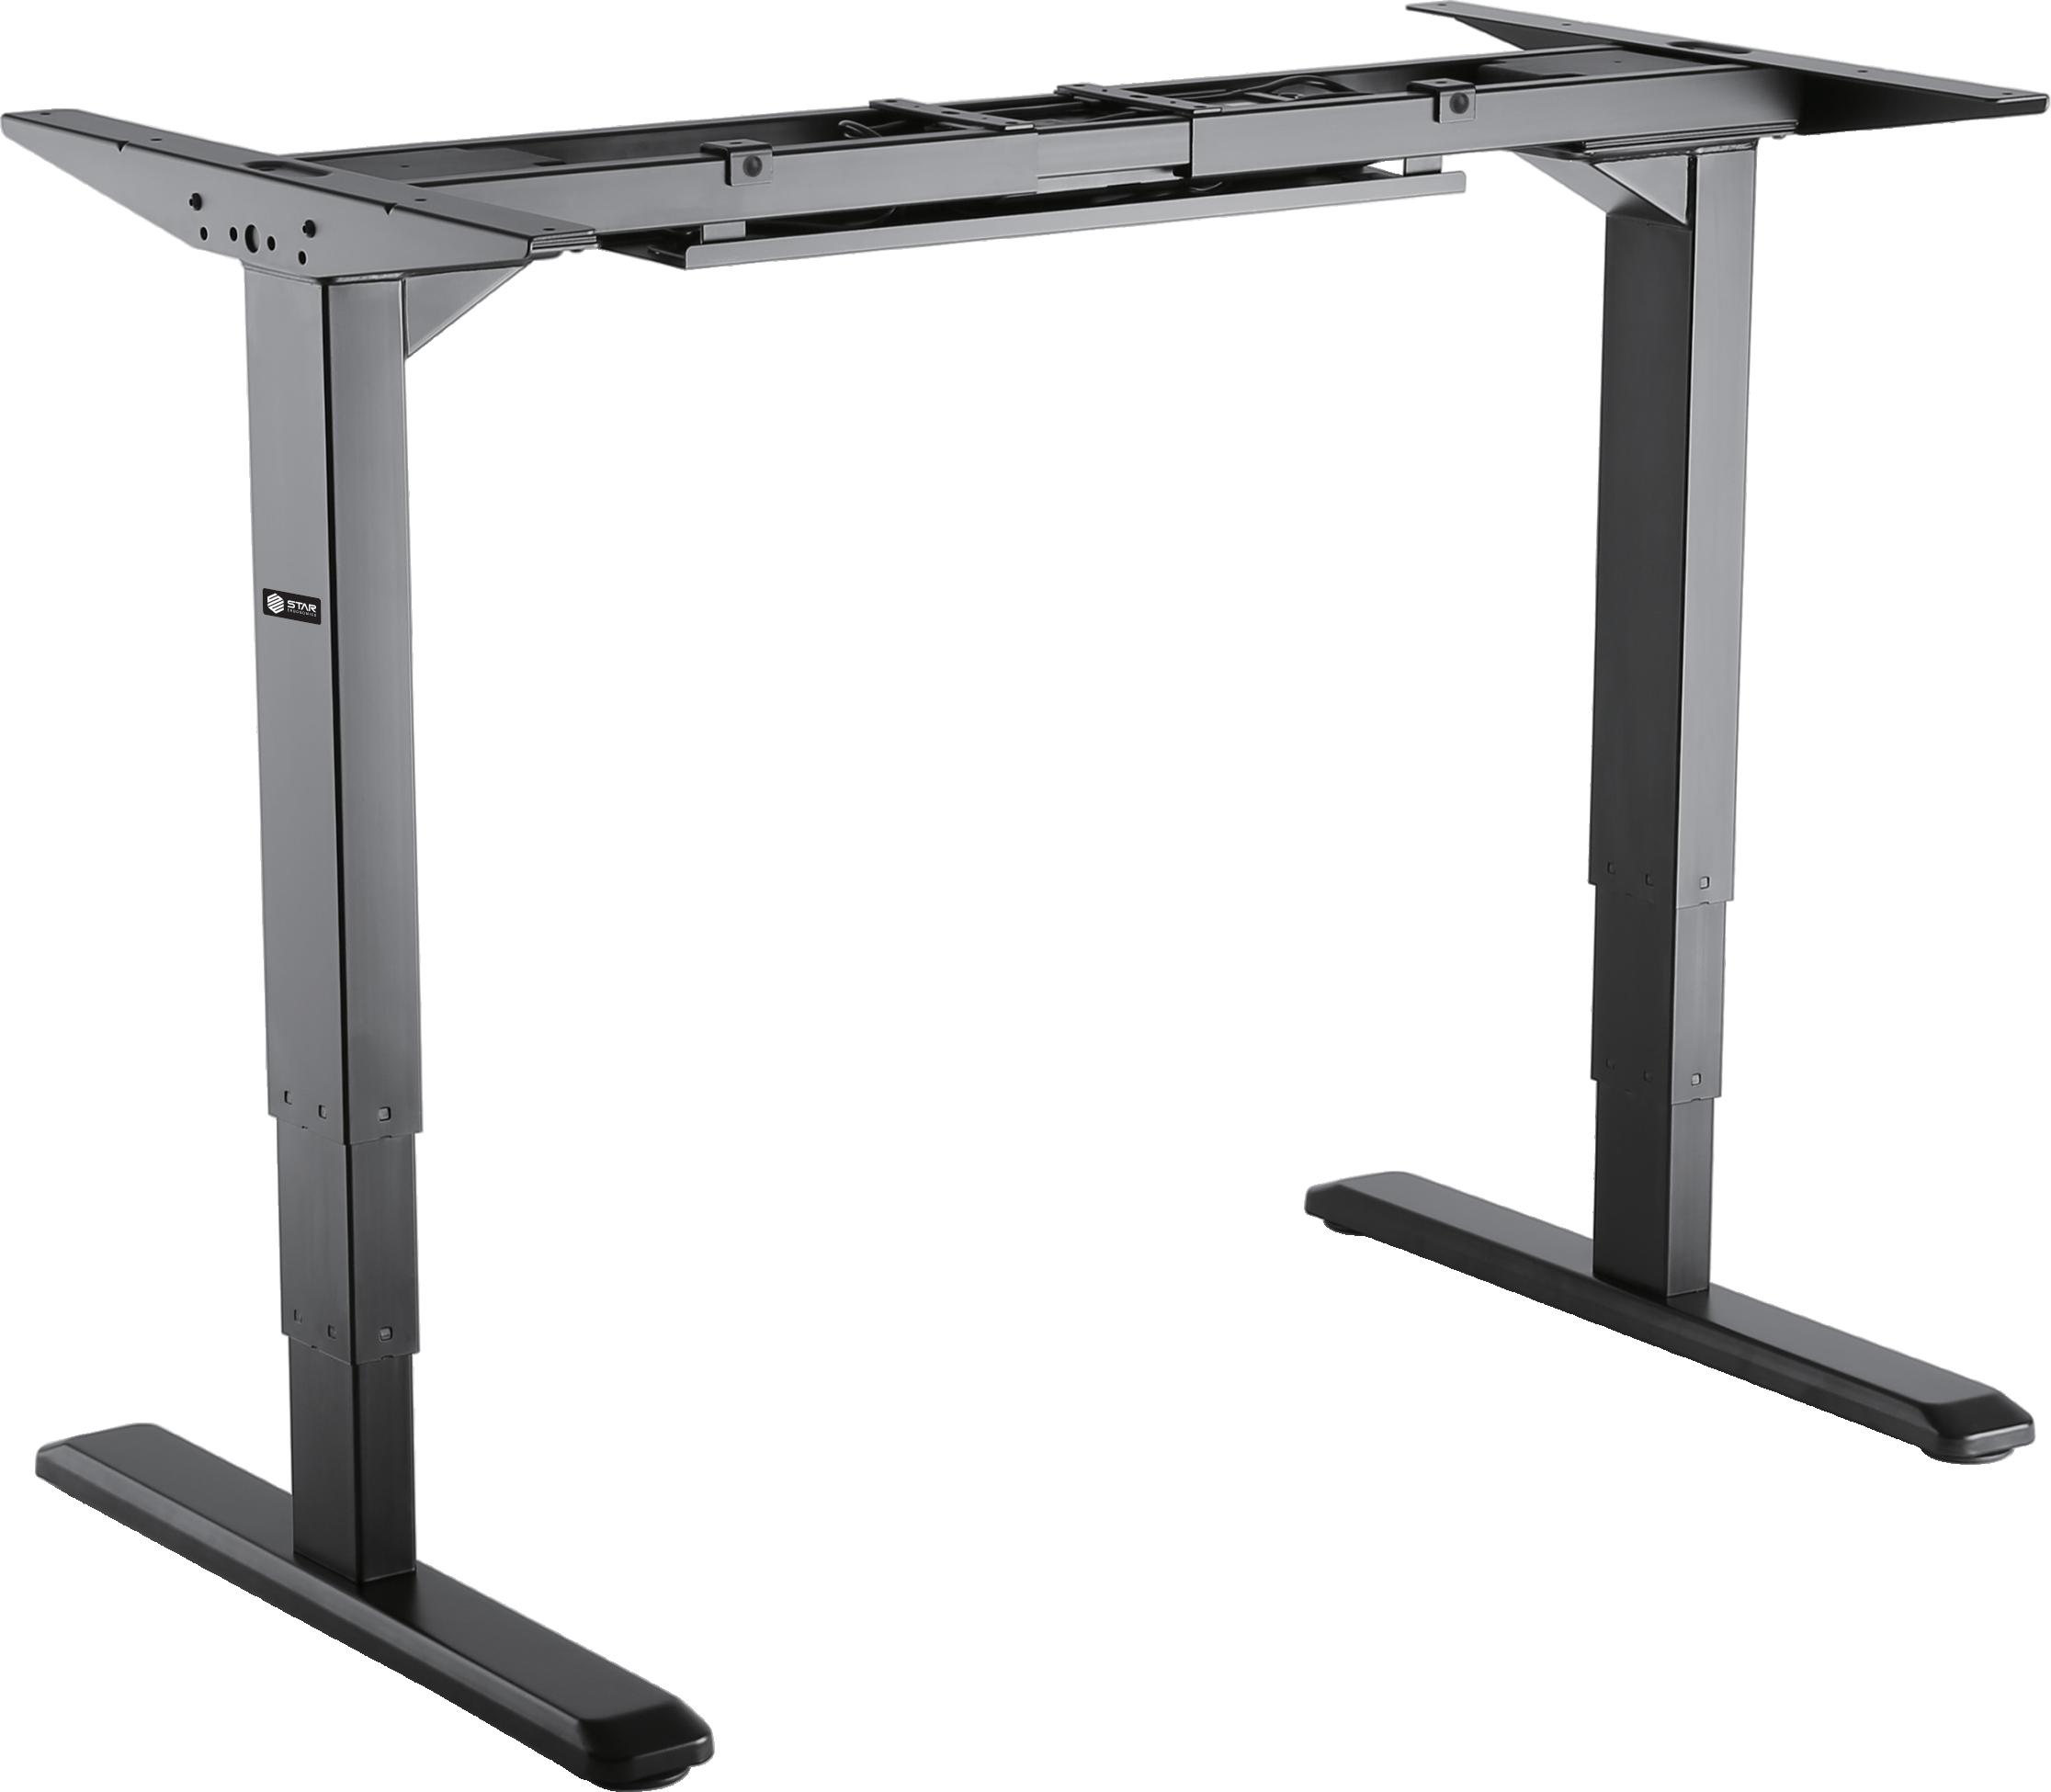 Buy Electric Standing Desk Frames Online At Best Price